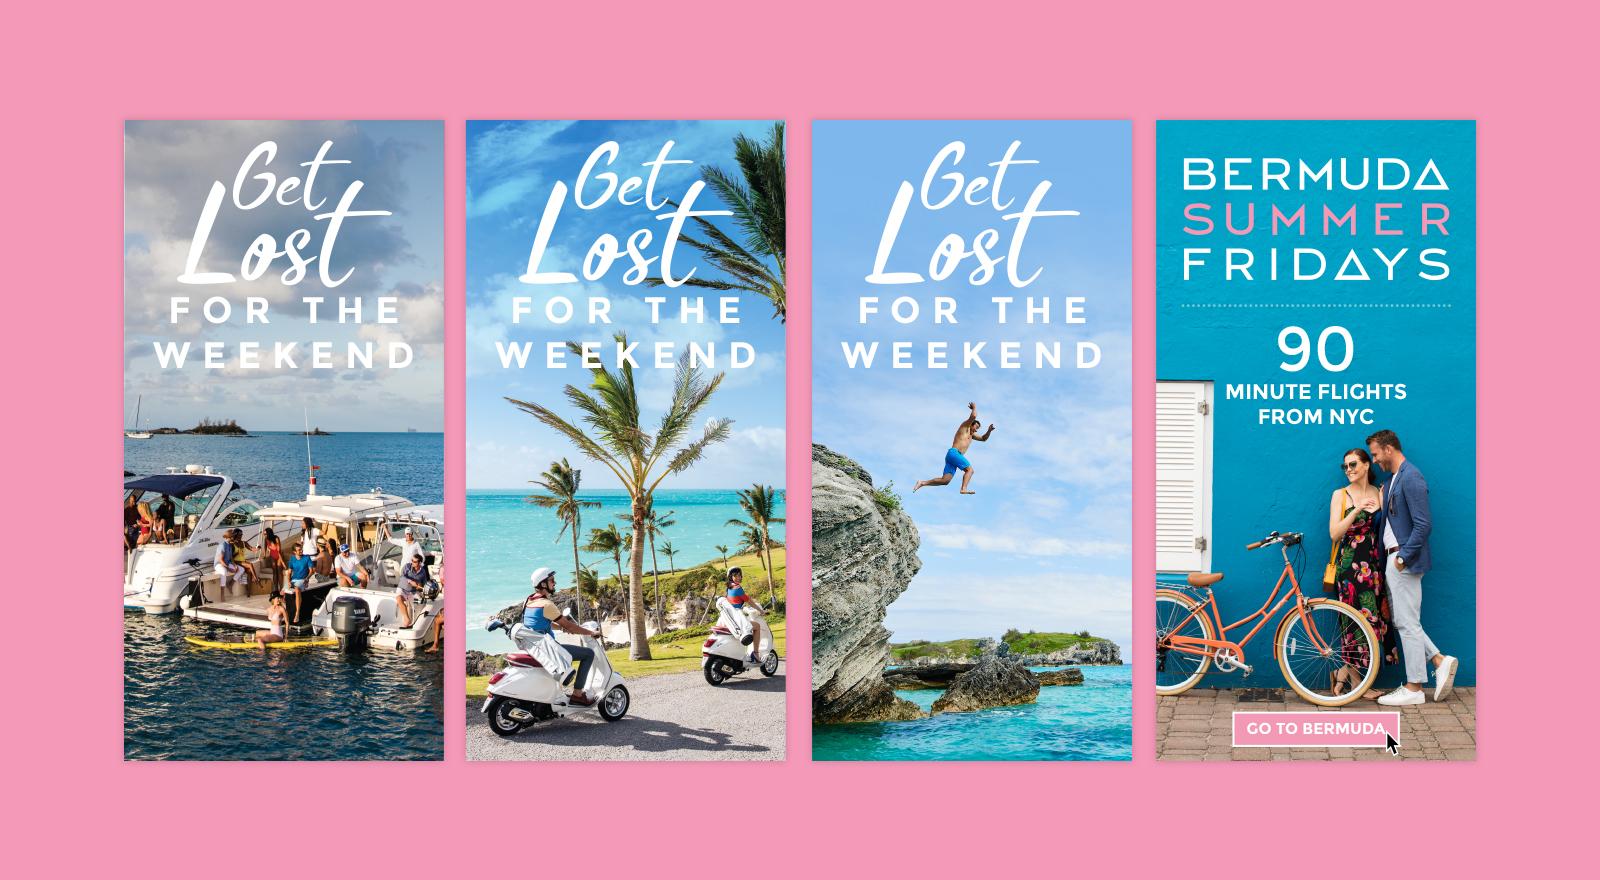 Bermuda digital banner ads